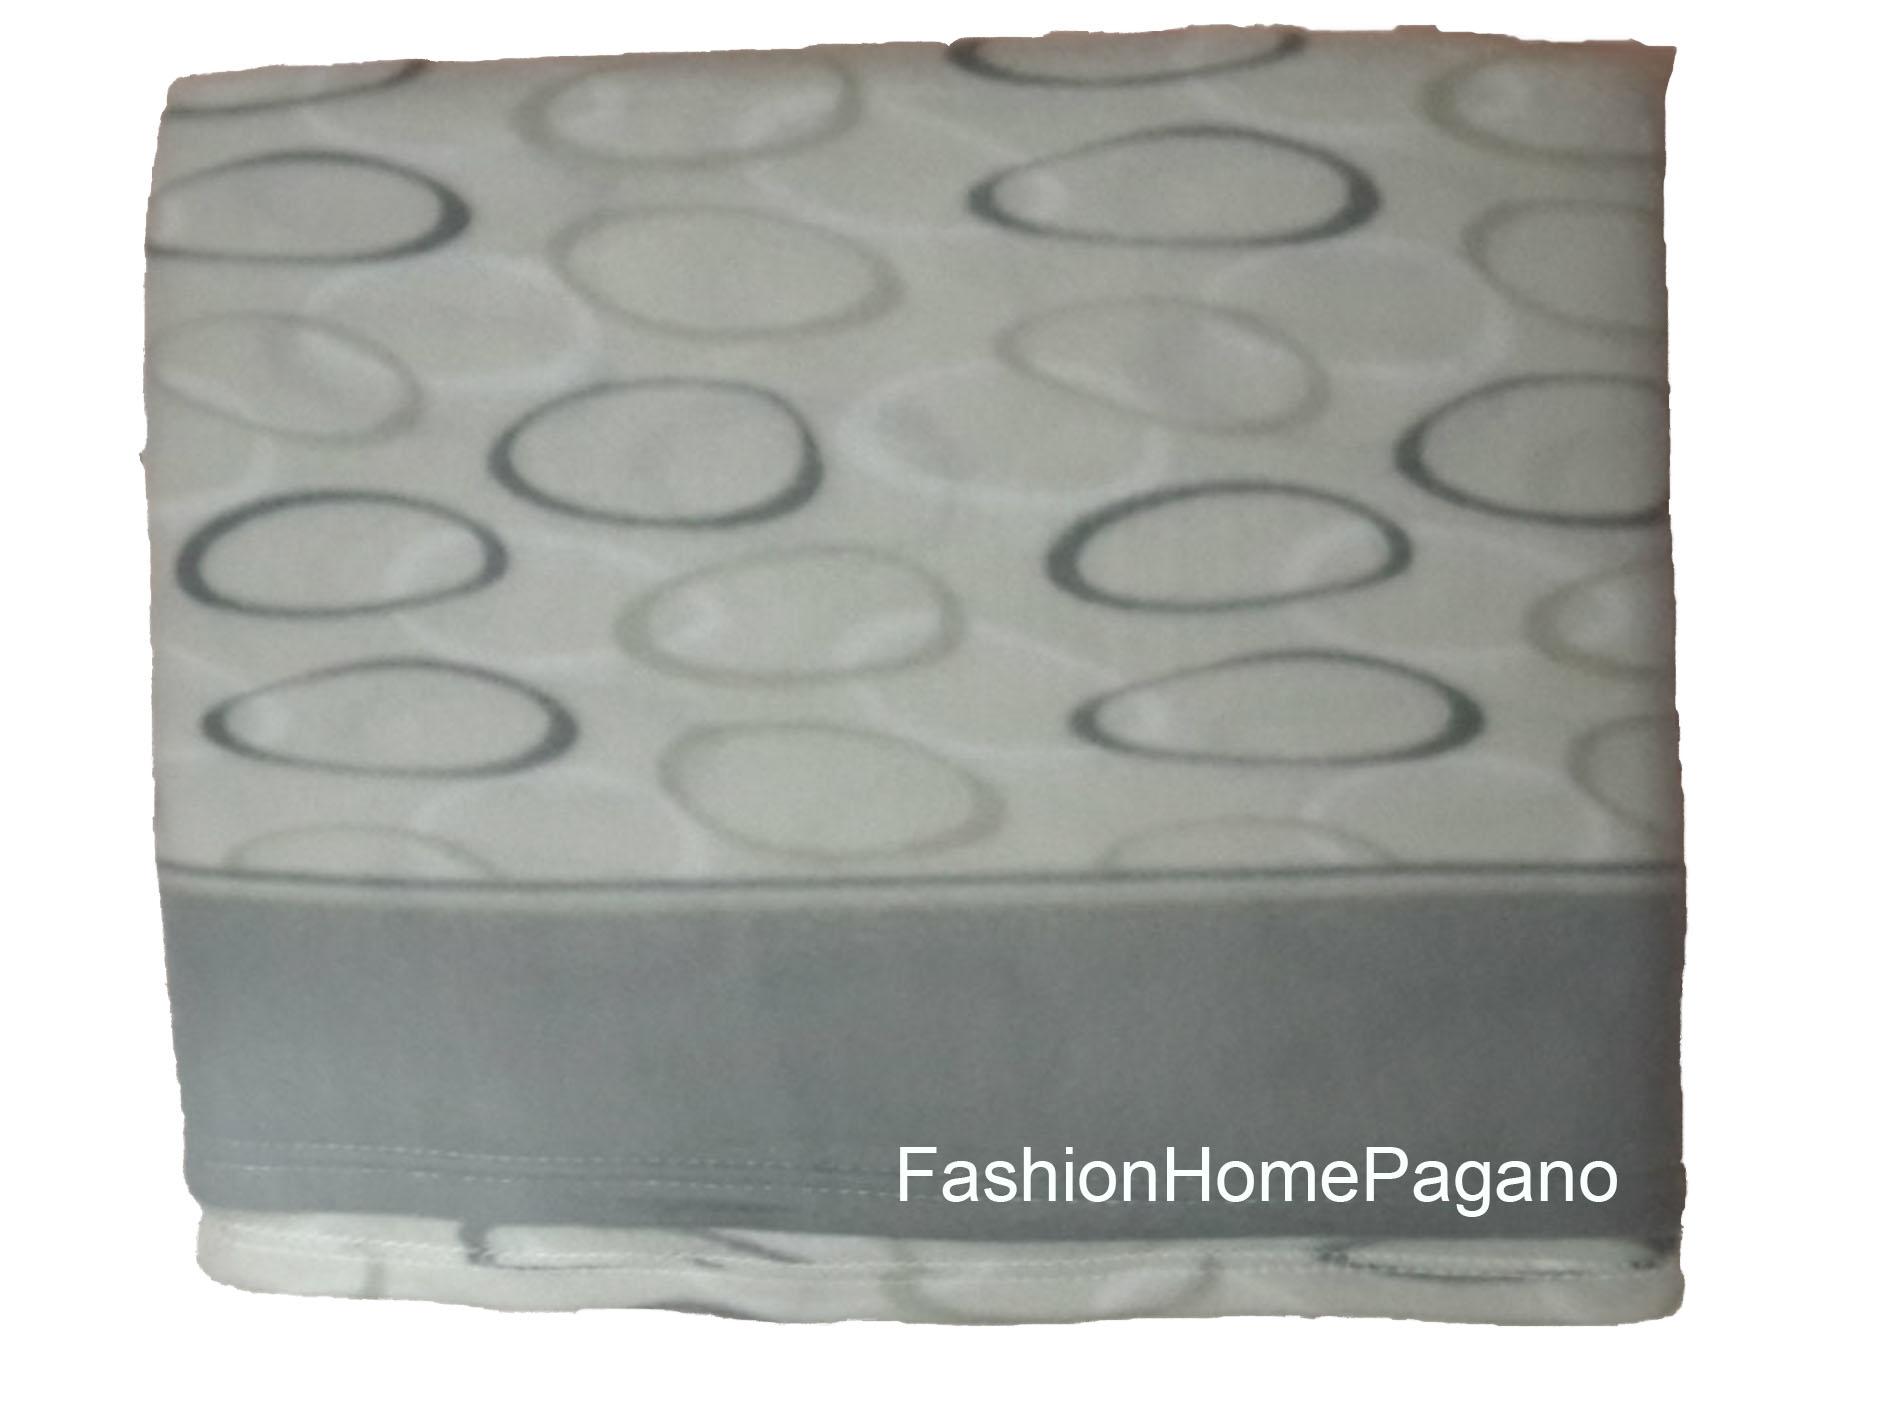 Lenzuola Matrimoniali Di Pile.Fhp 00207 Lenzuola Pile E Flanella Singola Fashion Home Pagano